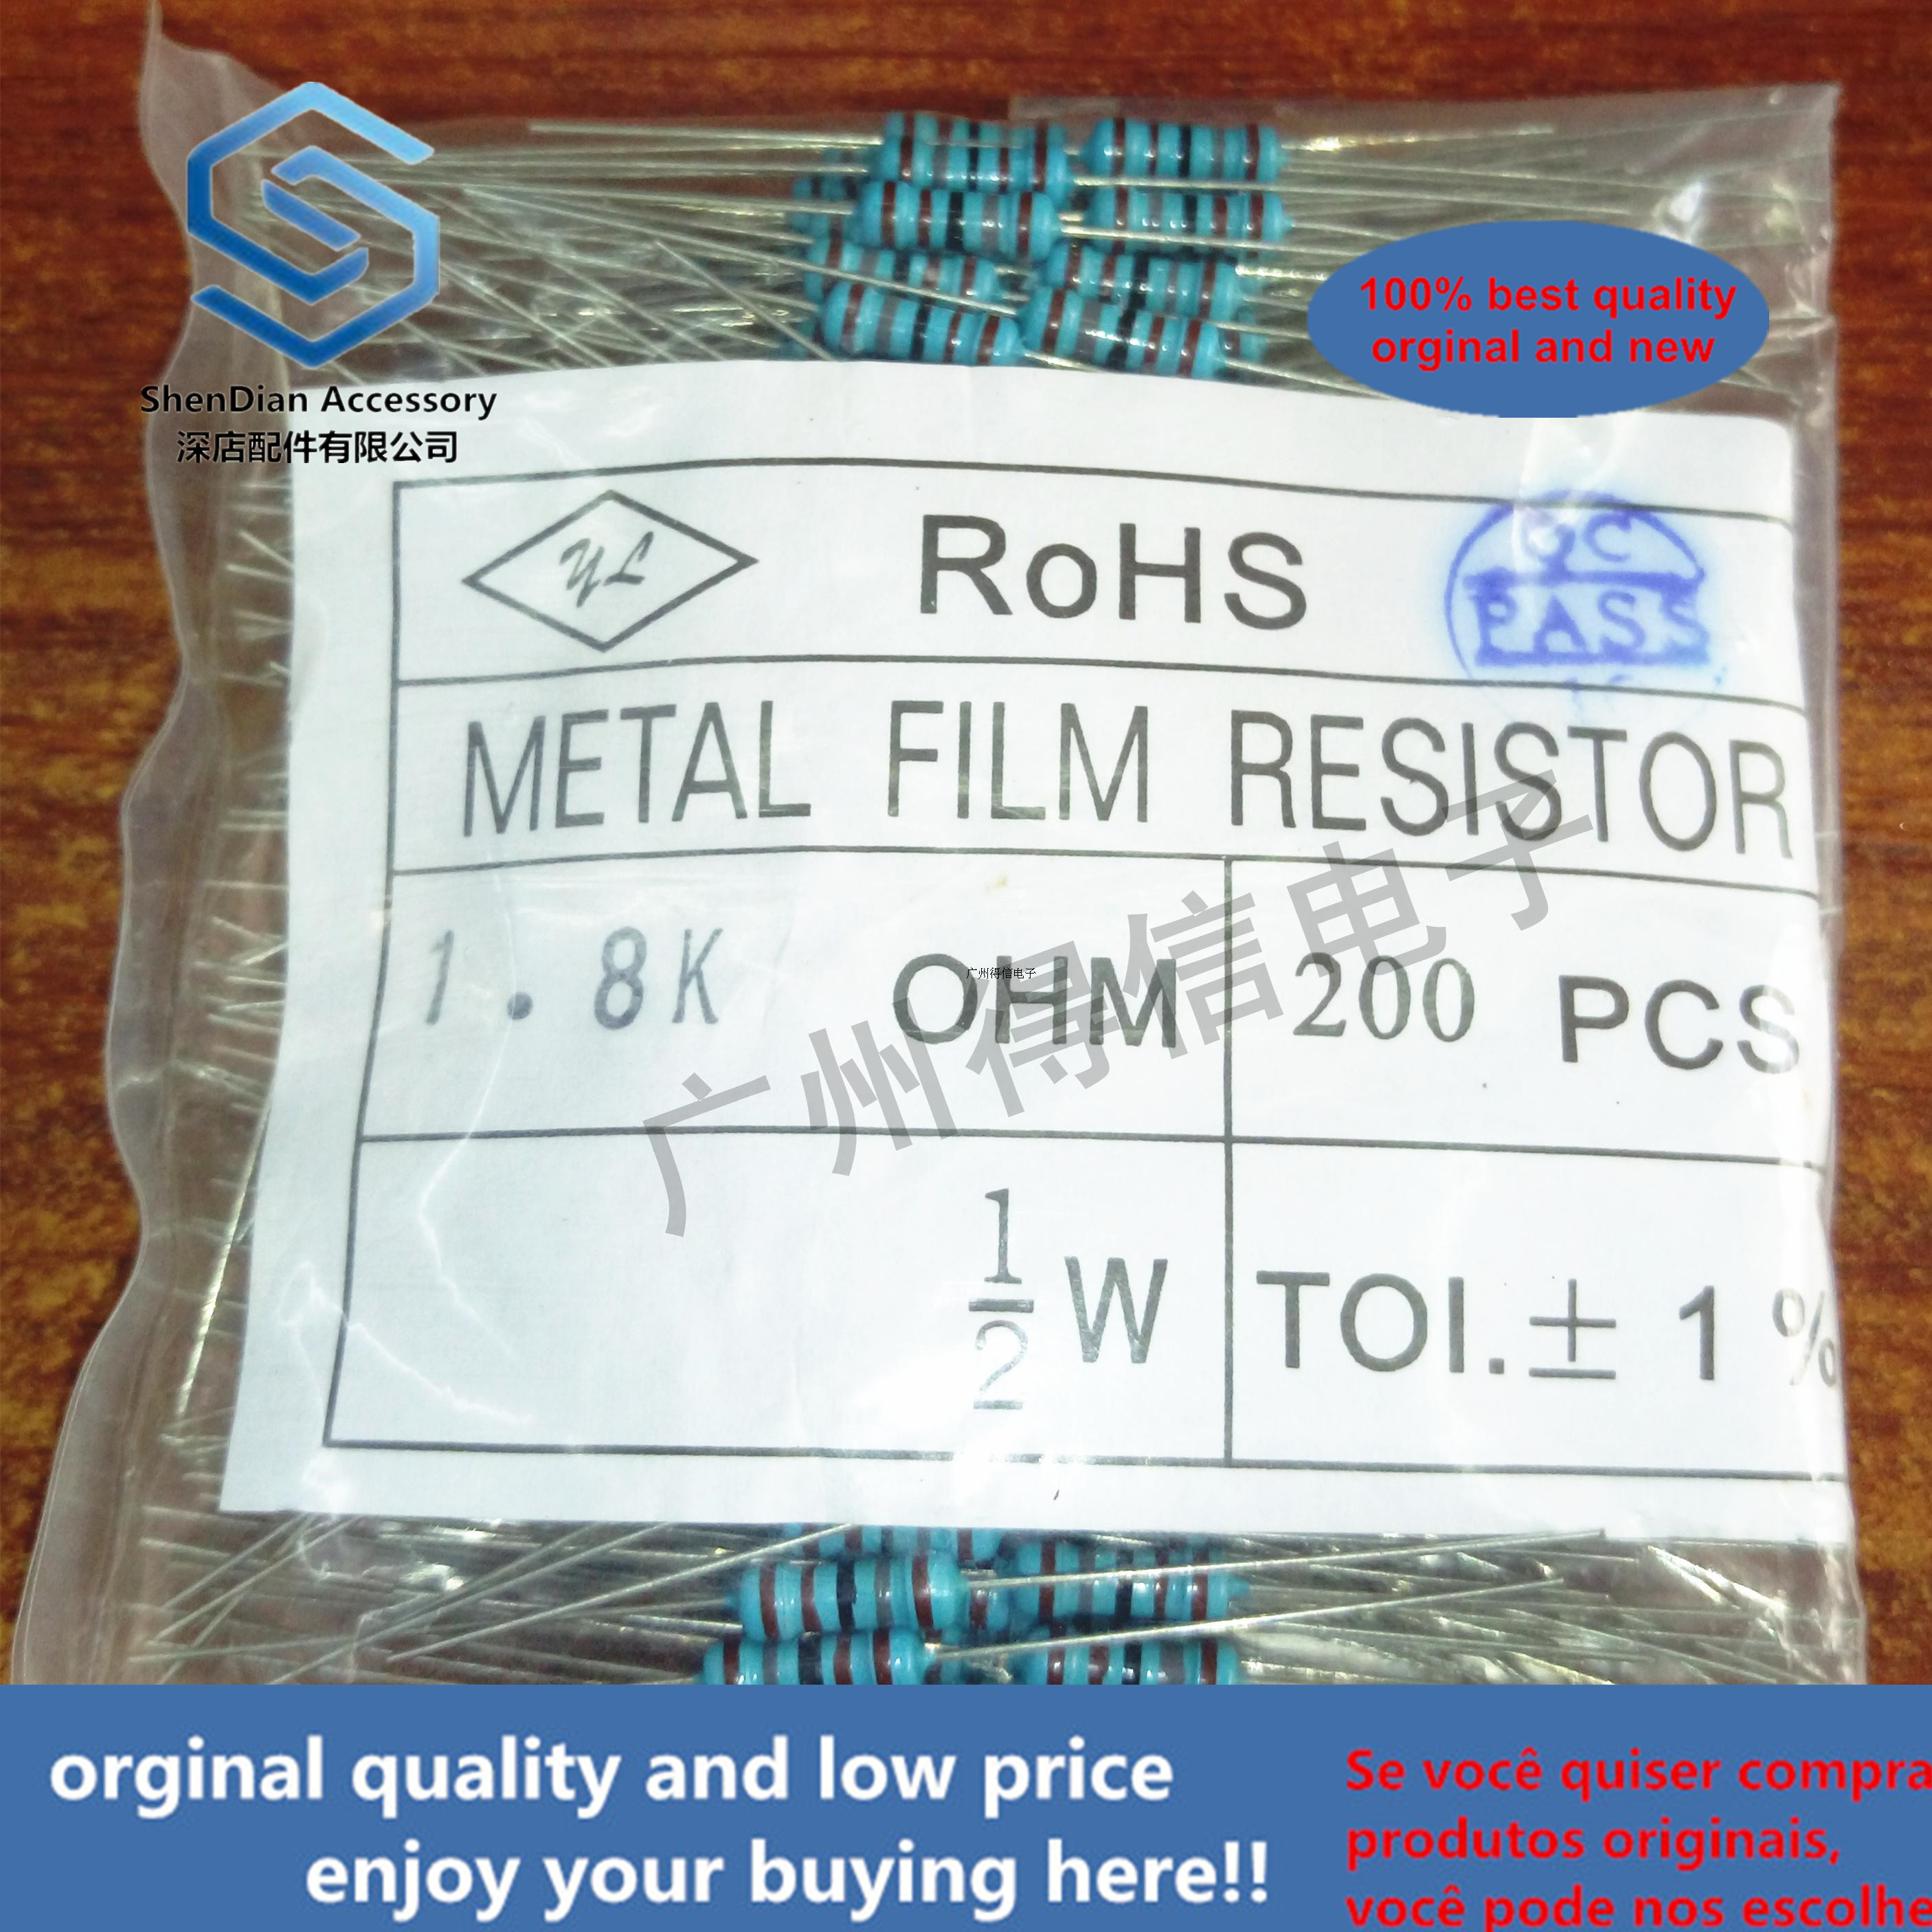 200pcs 1 / 2W 180K 1% Brand New Metal Film Iron Feet Resistor Bag 200 Pcs Per Pack